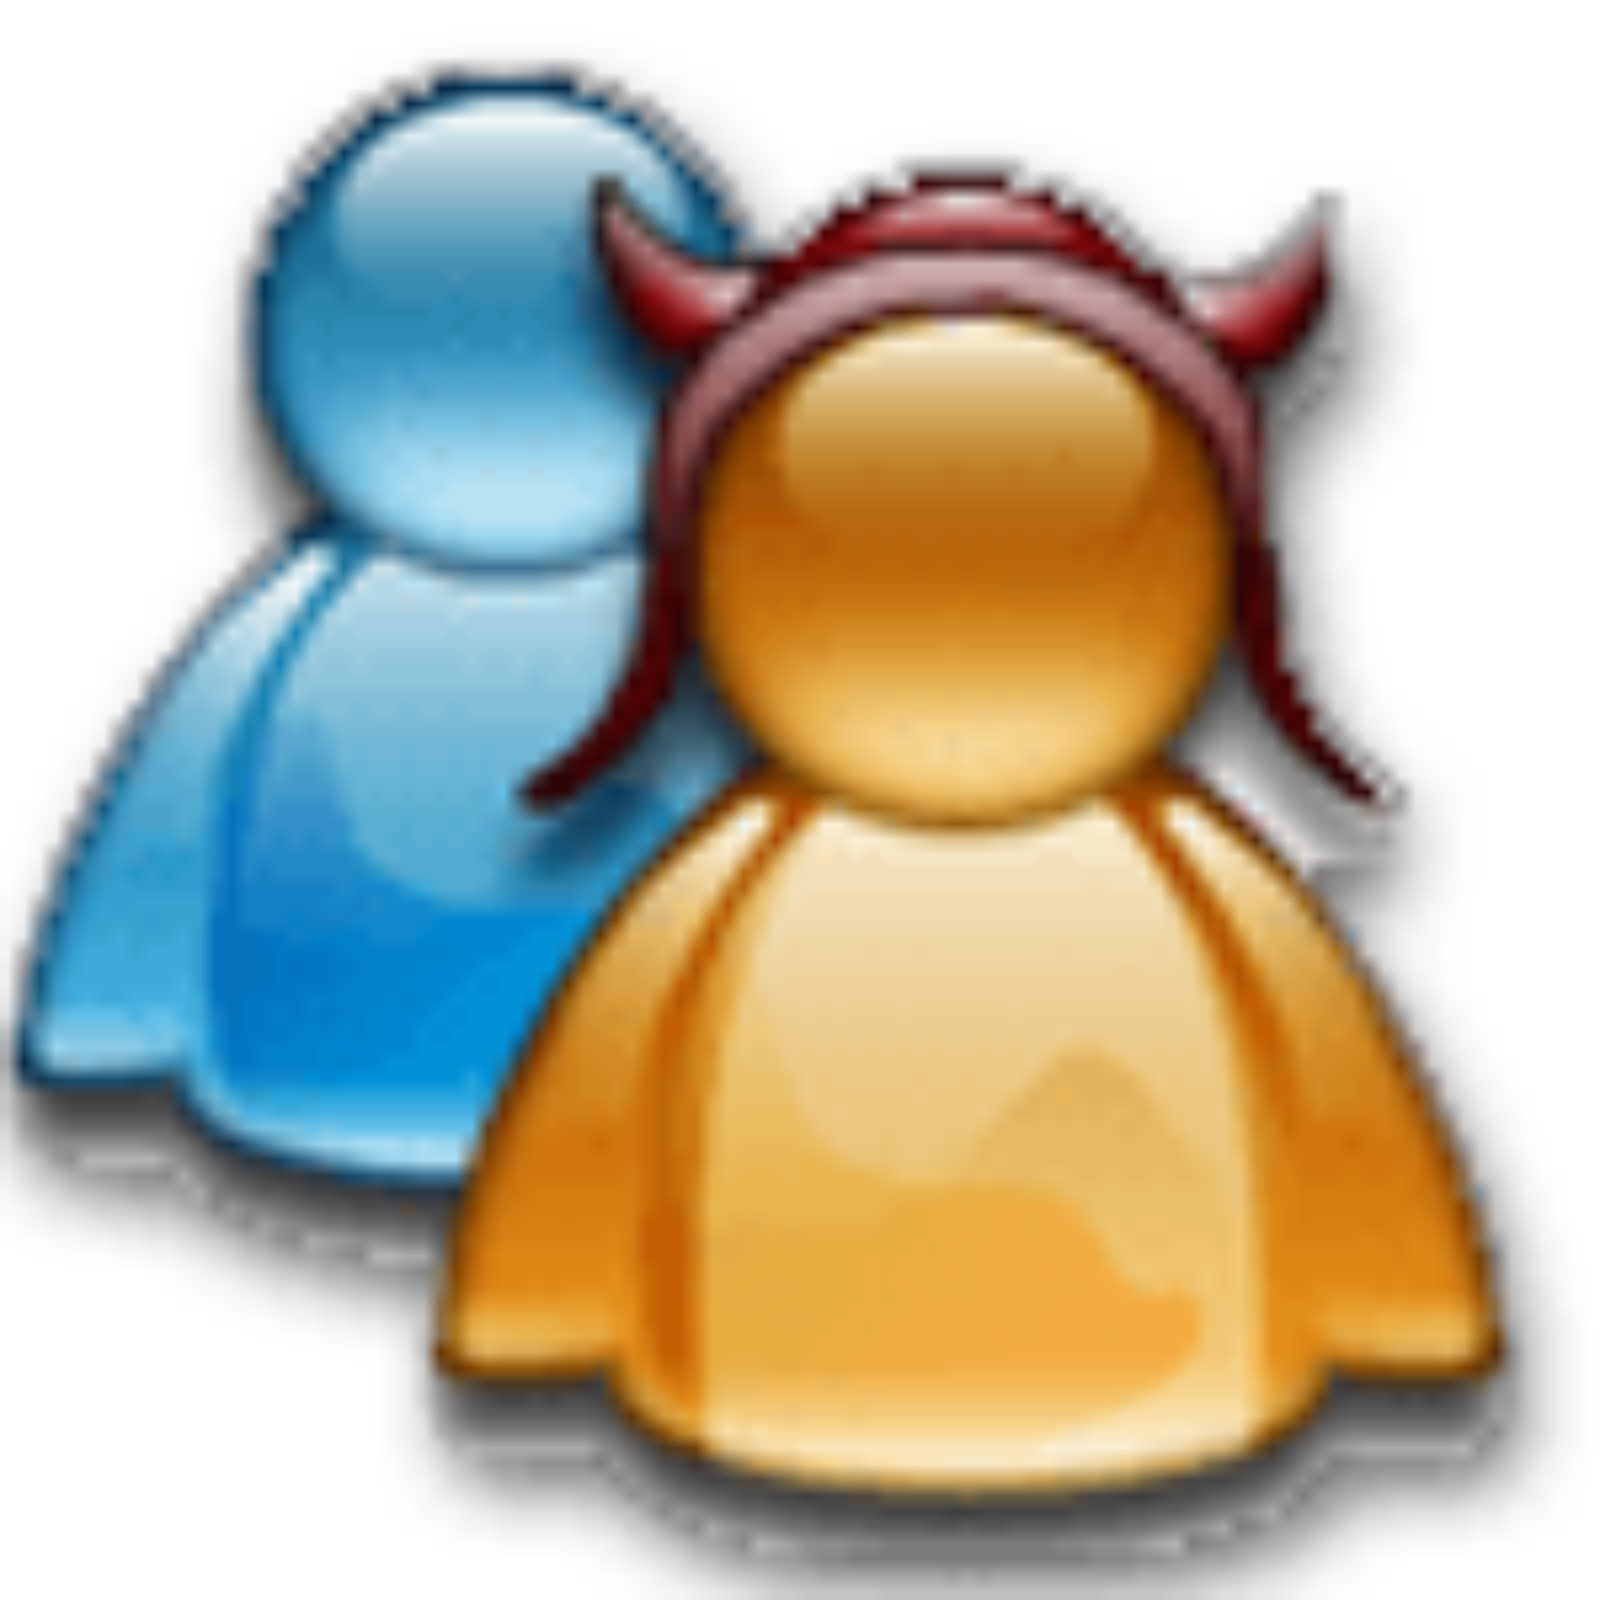 aMSN Portable Messenger